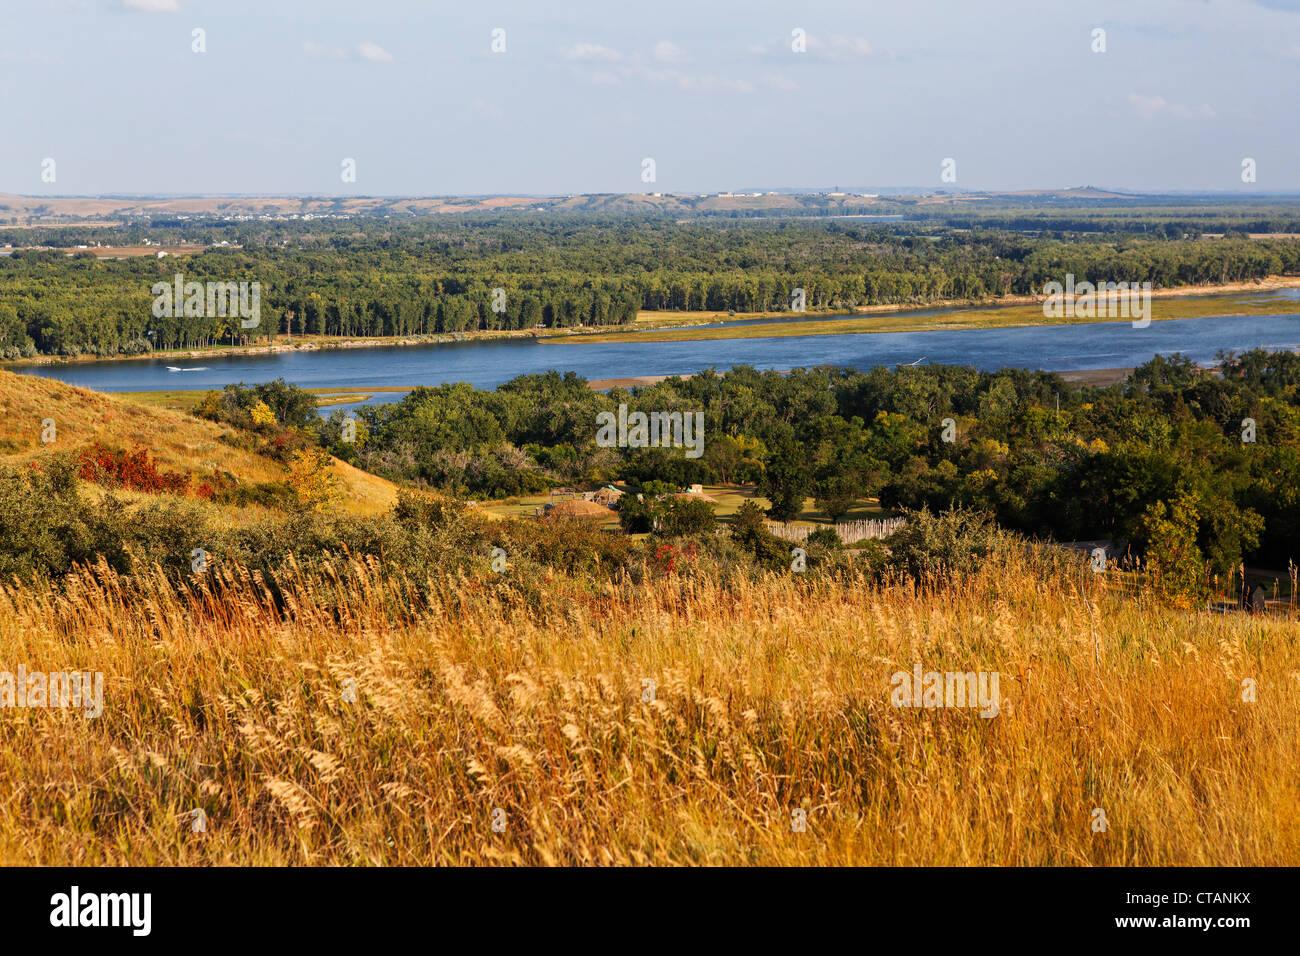 Open air museums village of Mandan indians, Abraham Lincoln State Park, Bismarck, Burleigh County, North Dakota, - Stock Image